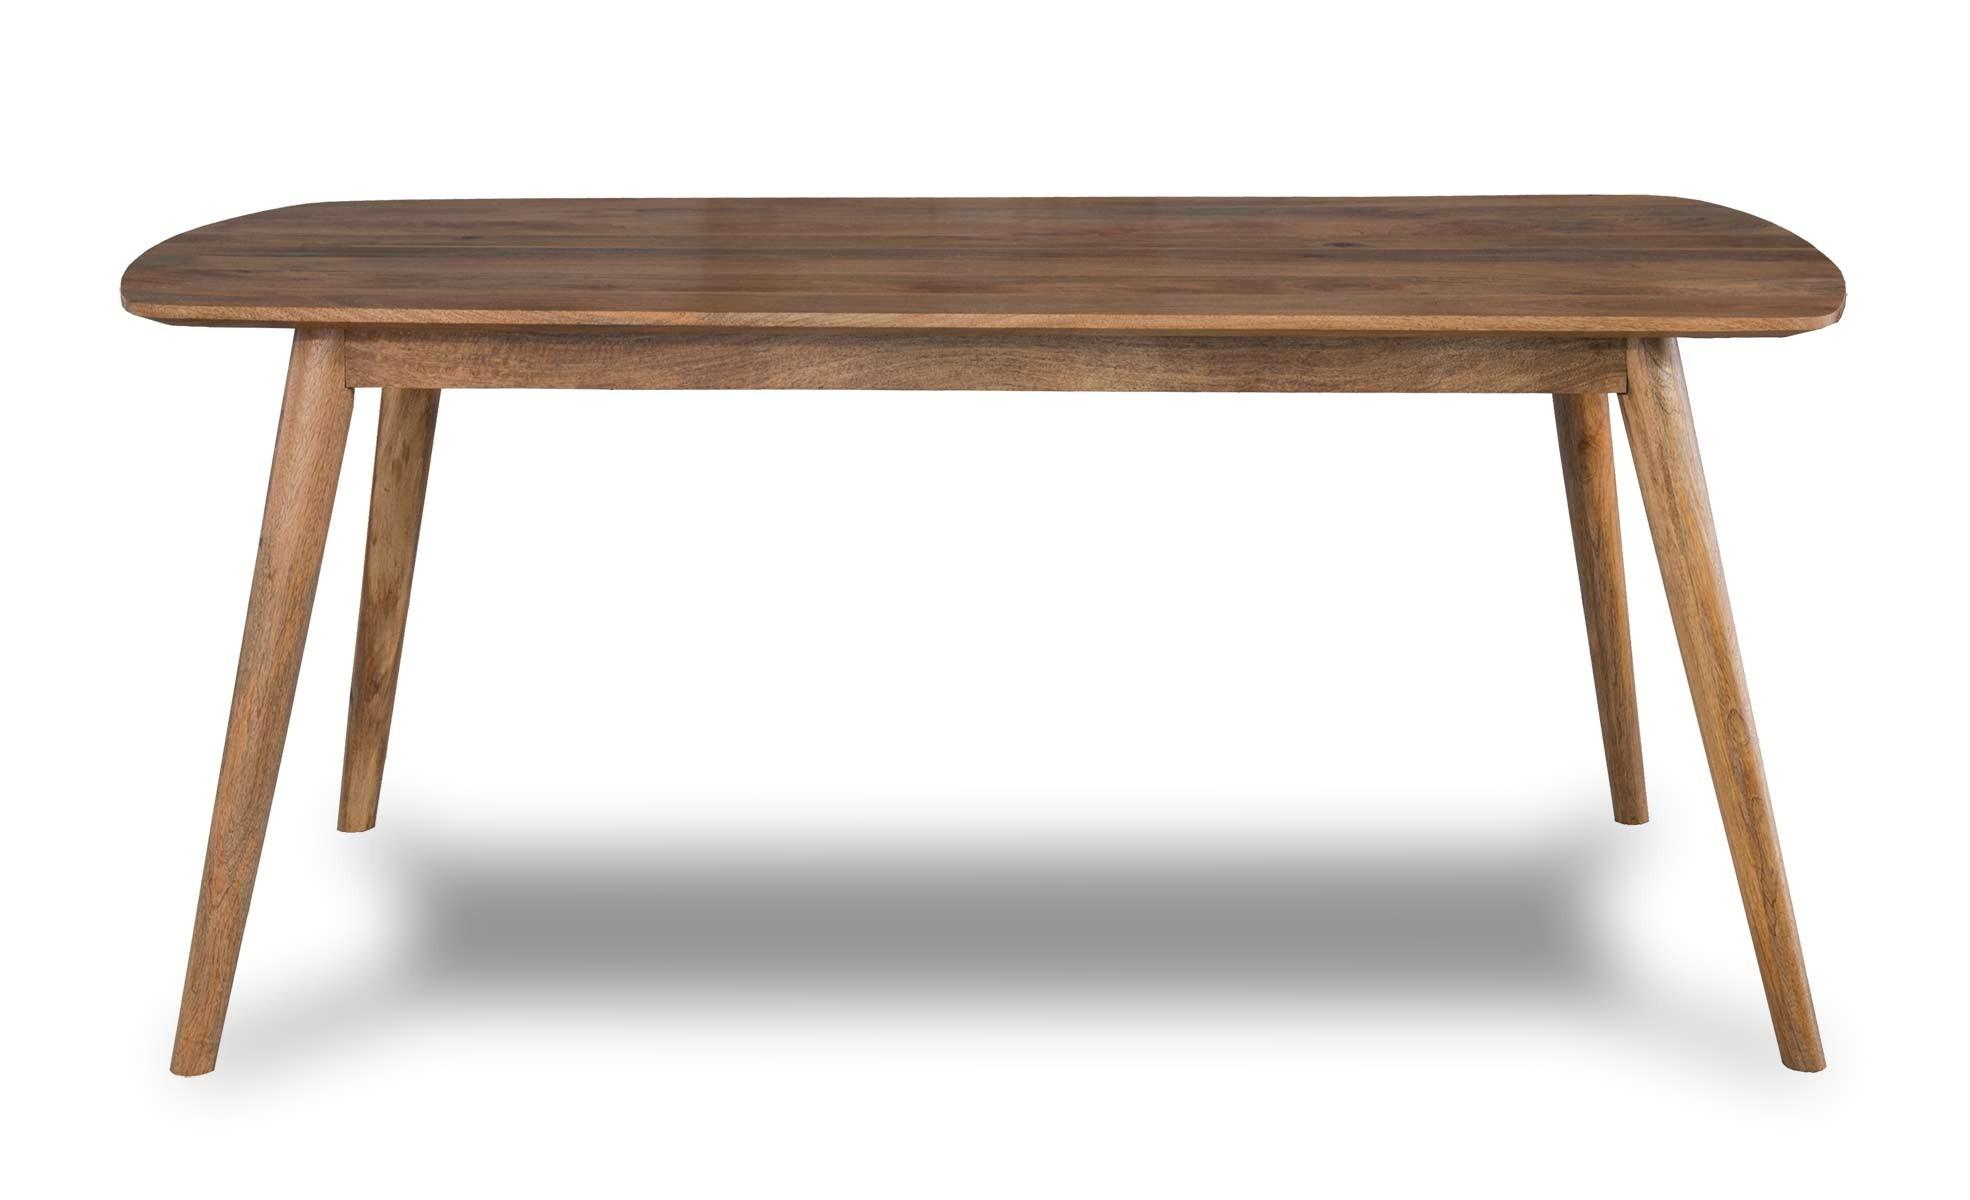 Solid Light Mango Wood Dining Table Retro Scandi Style